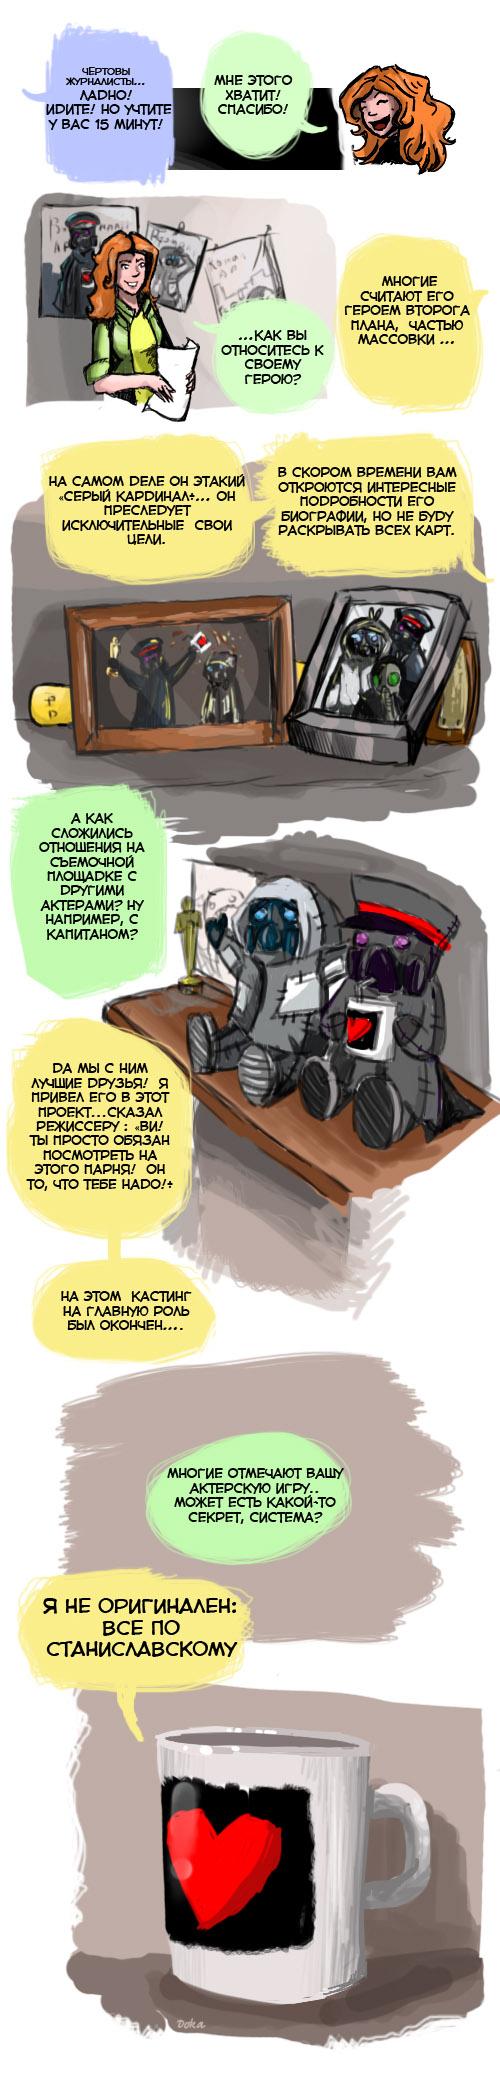 Комикс-битва №14 выпуск 101